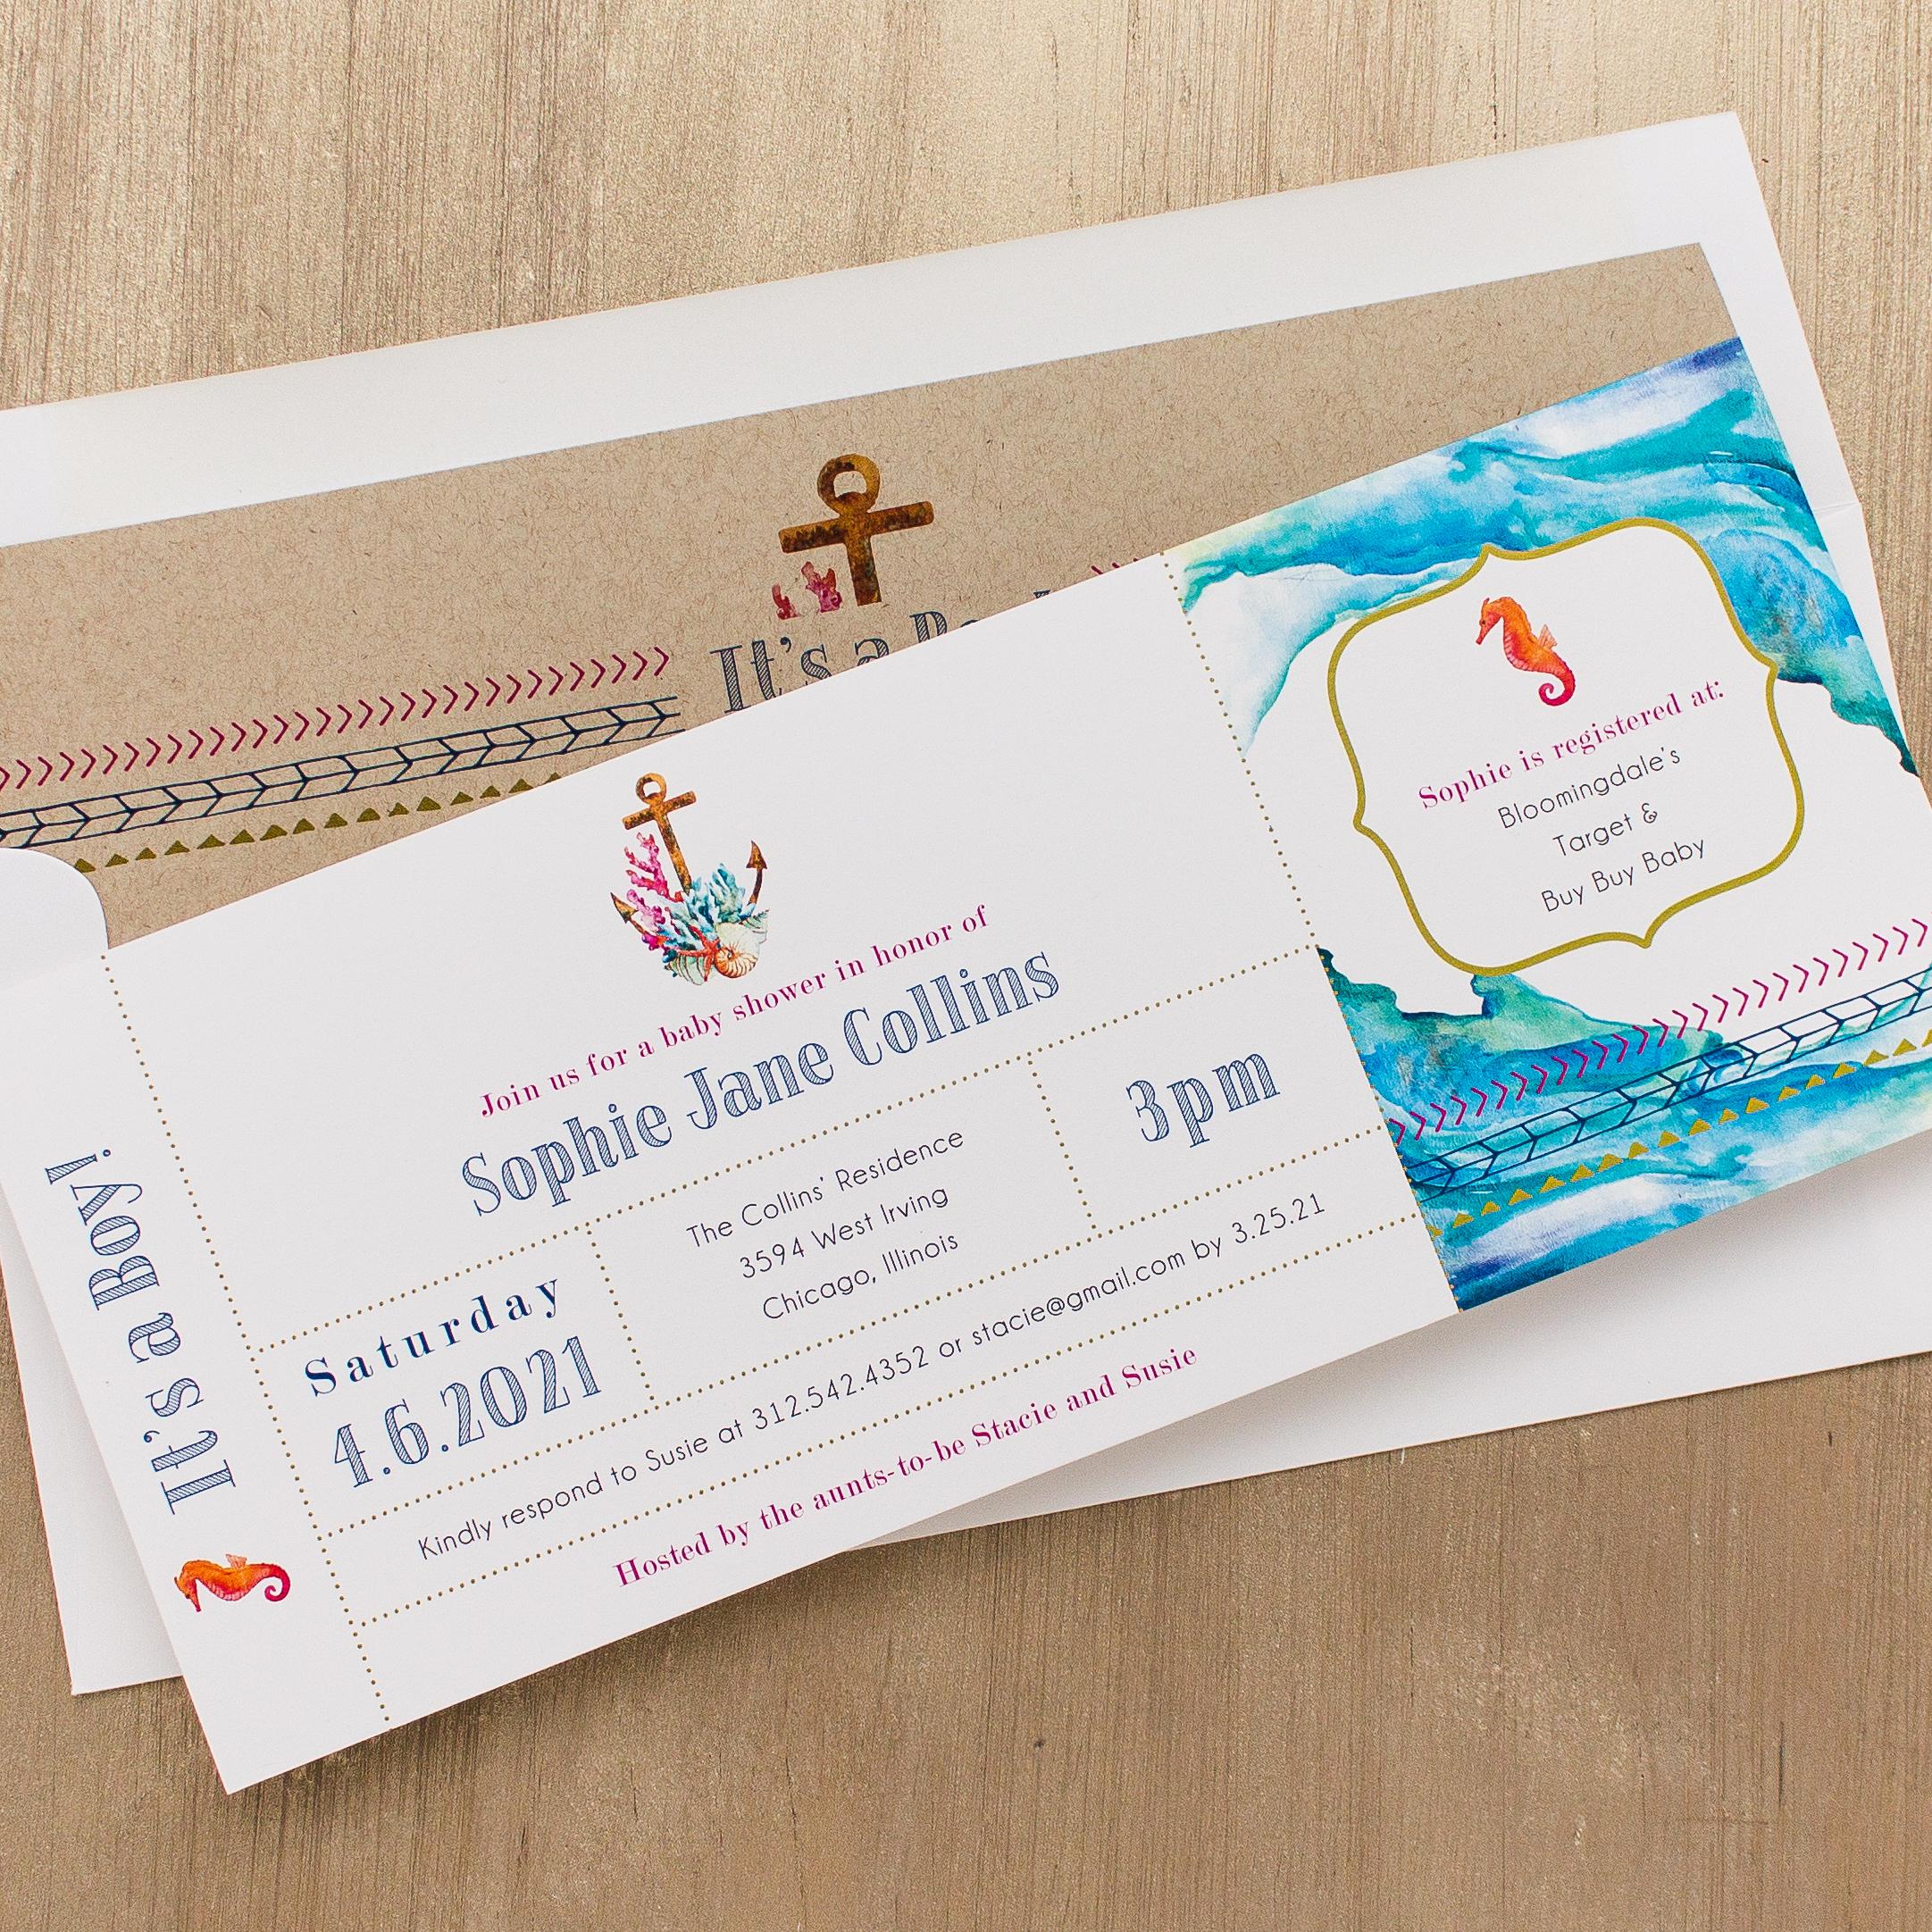 Under The Sea Baby Shower Invitations | Beacon Lane